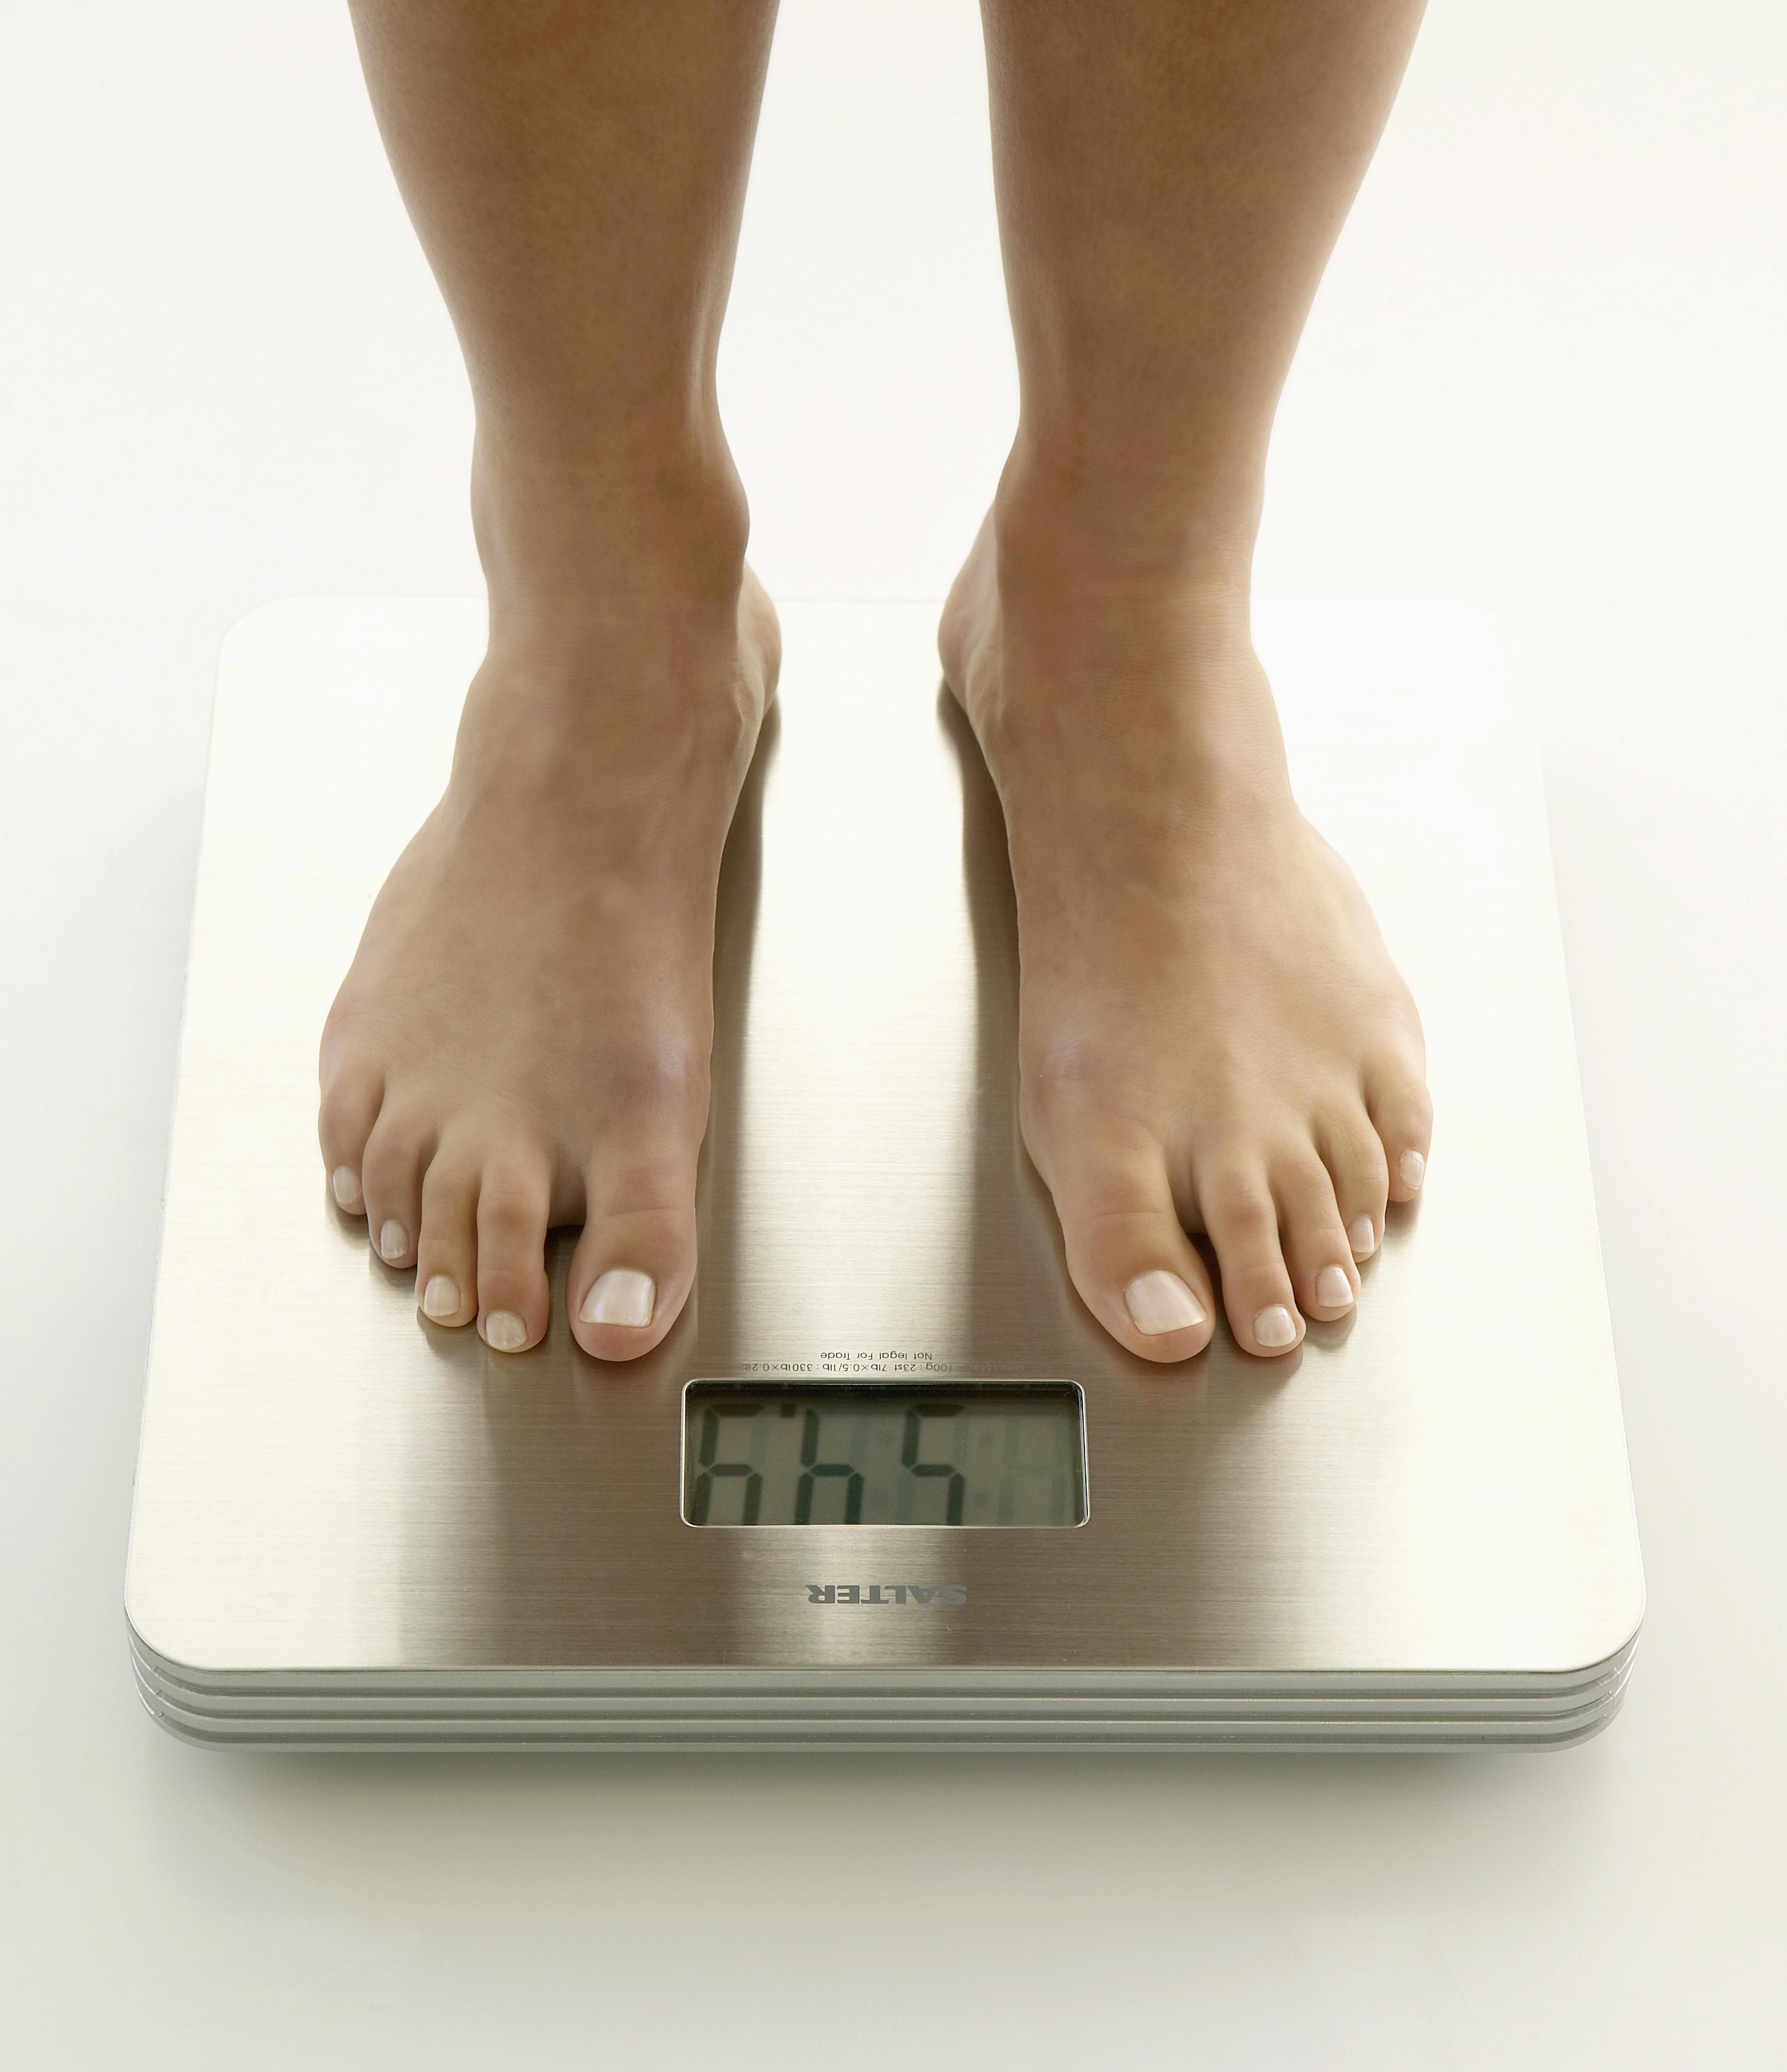 2 luni pierd in greutate ADN 24 slăbire